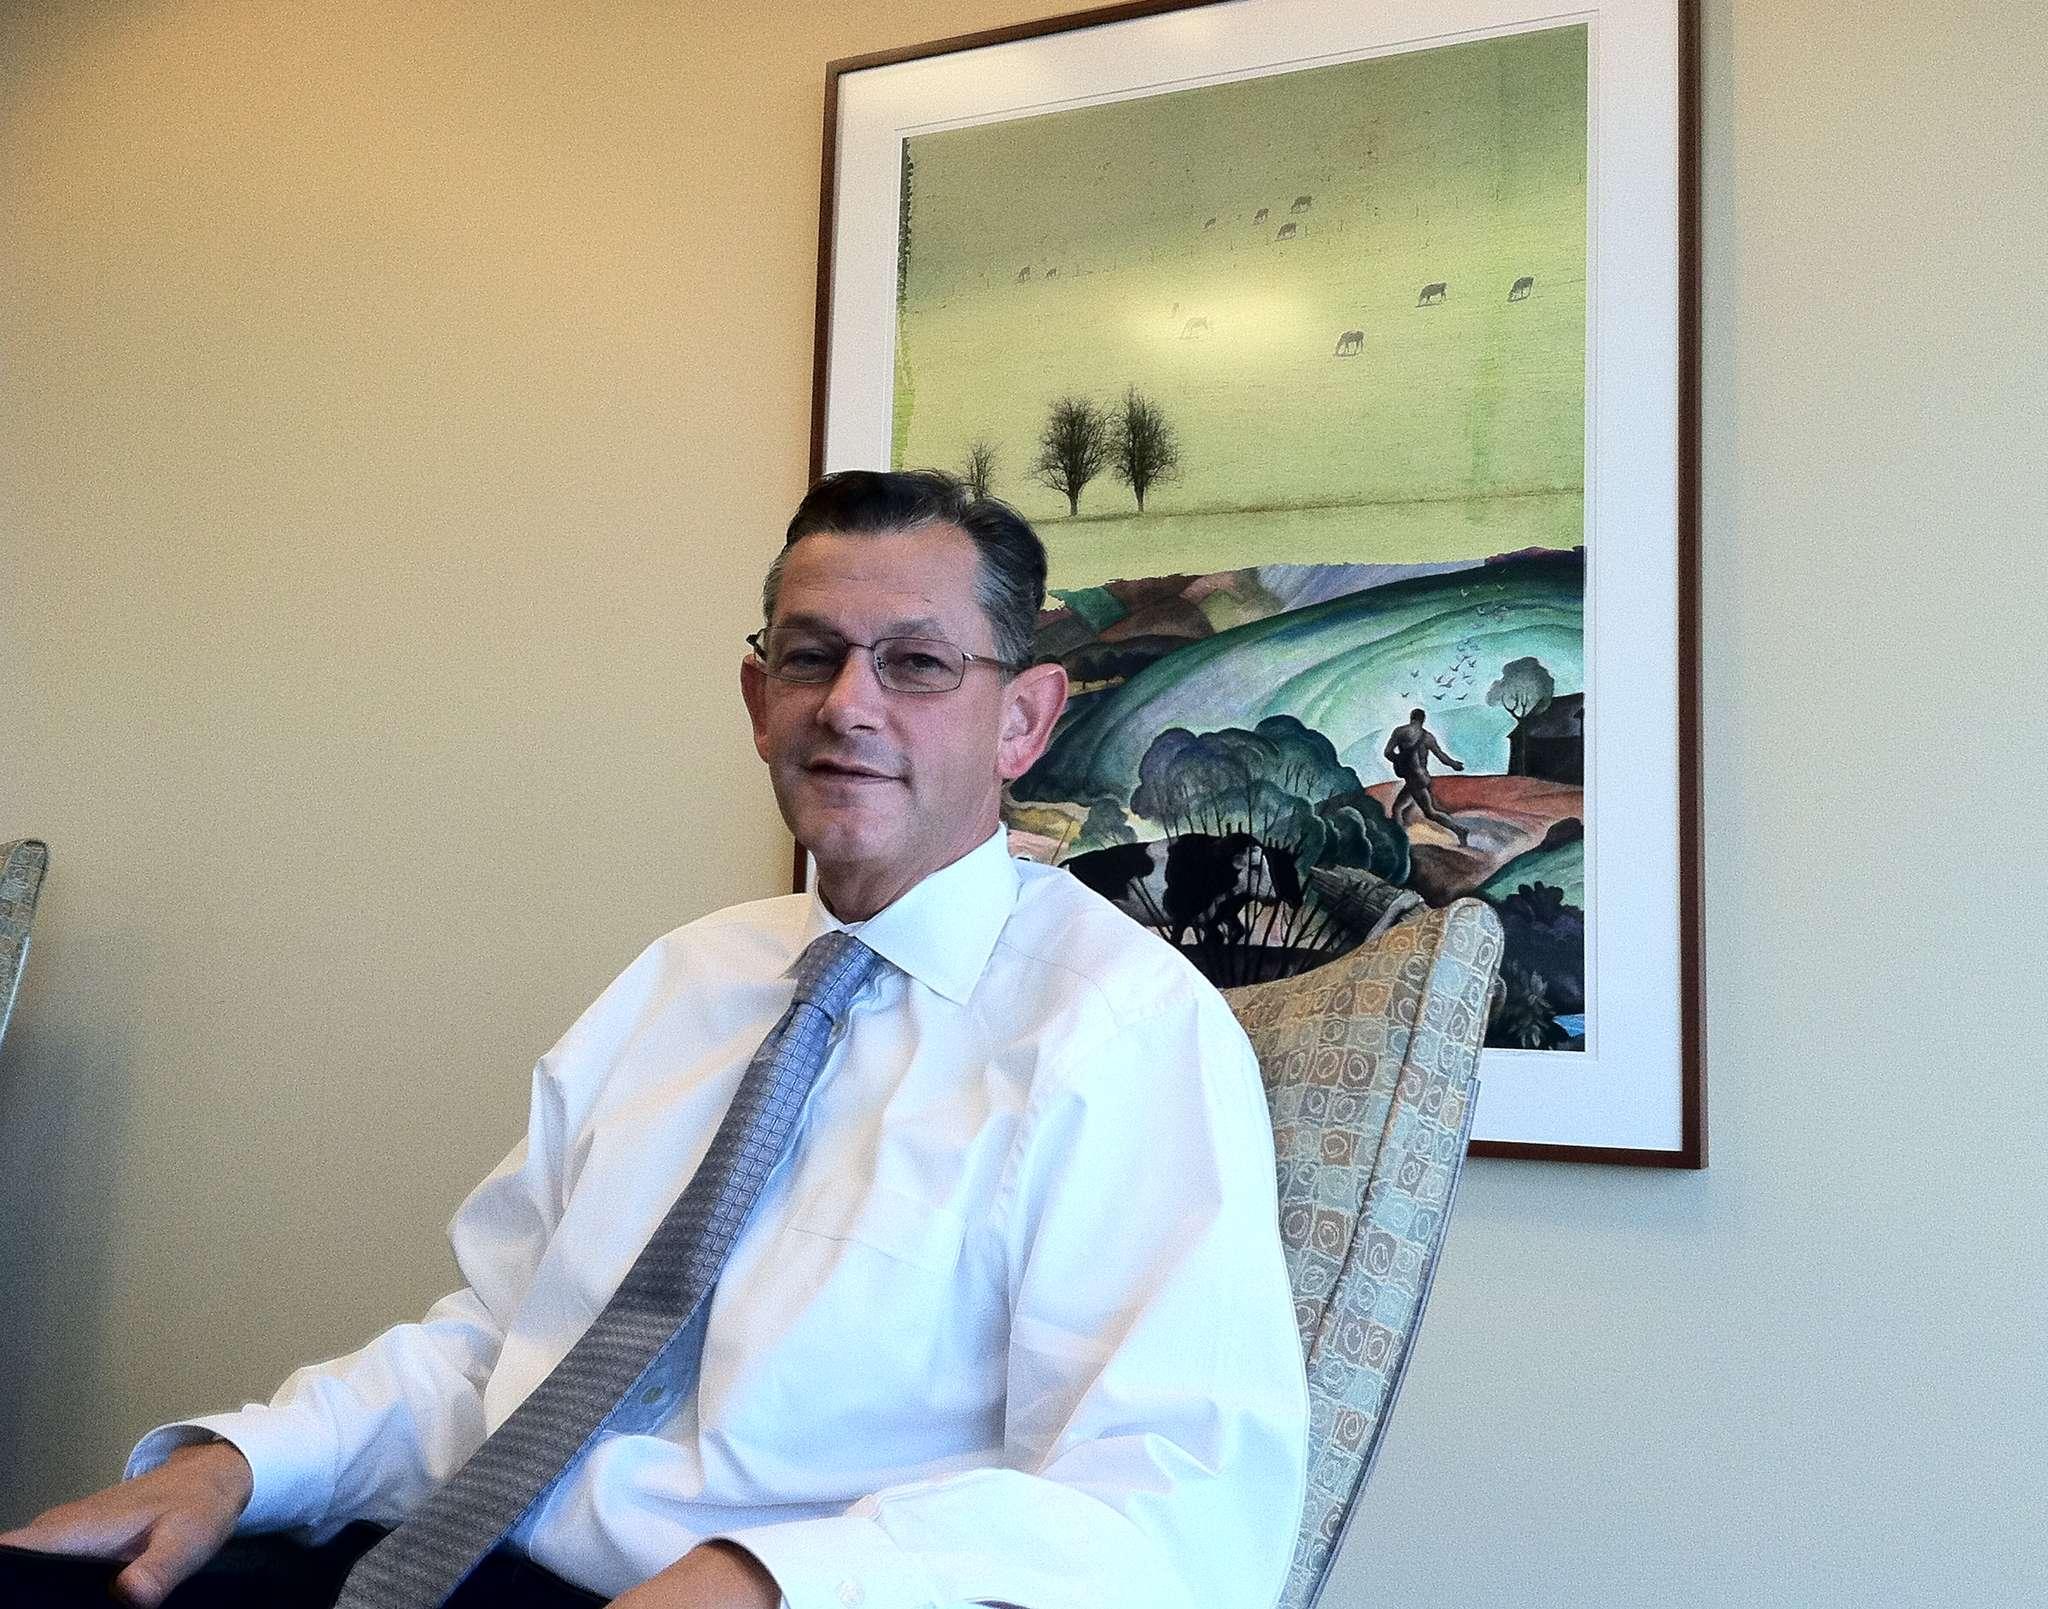 WSFS chief executive Mark Turner, a Philadelphia native, says he will turn Penn Liberty´s Lancaster Avenue headquarters into WSFS´s Pennsylvania hub.